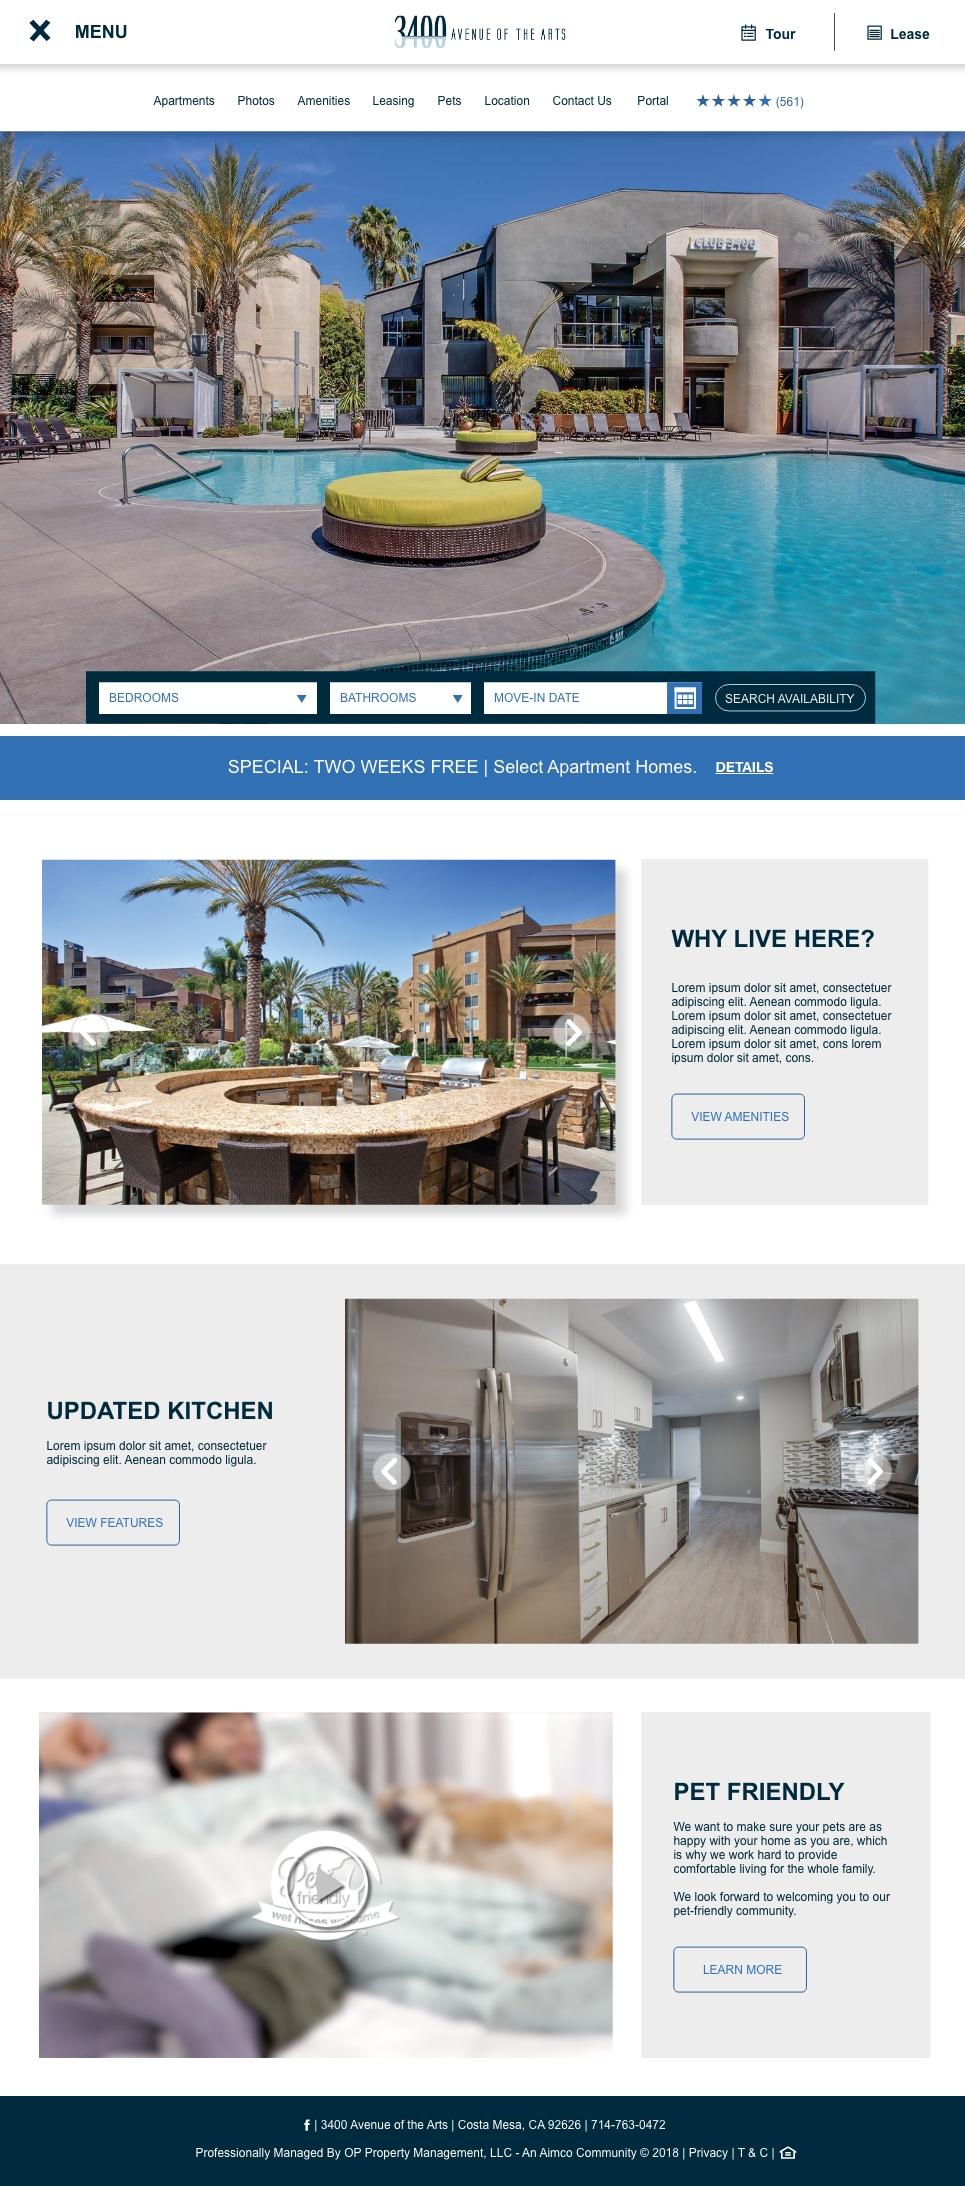 Homepage_WEB_OPTION1 - 16.jpg